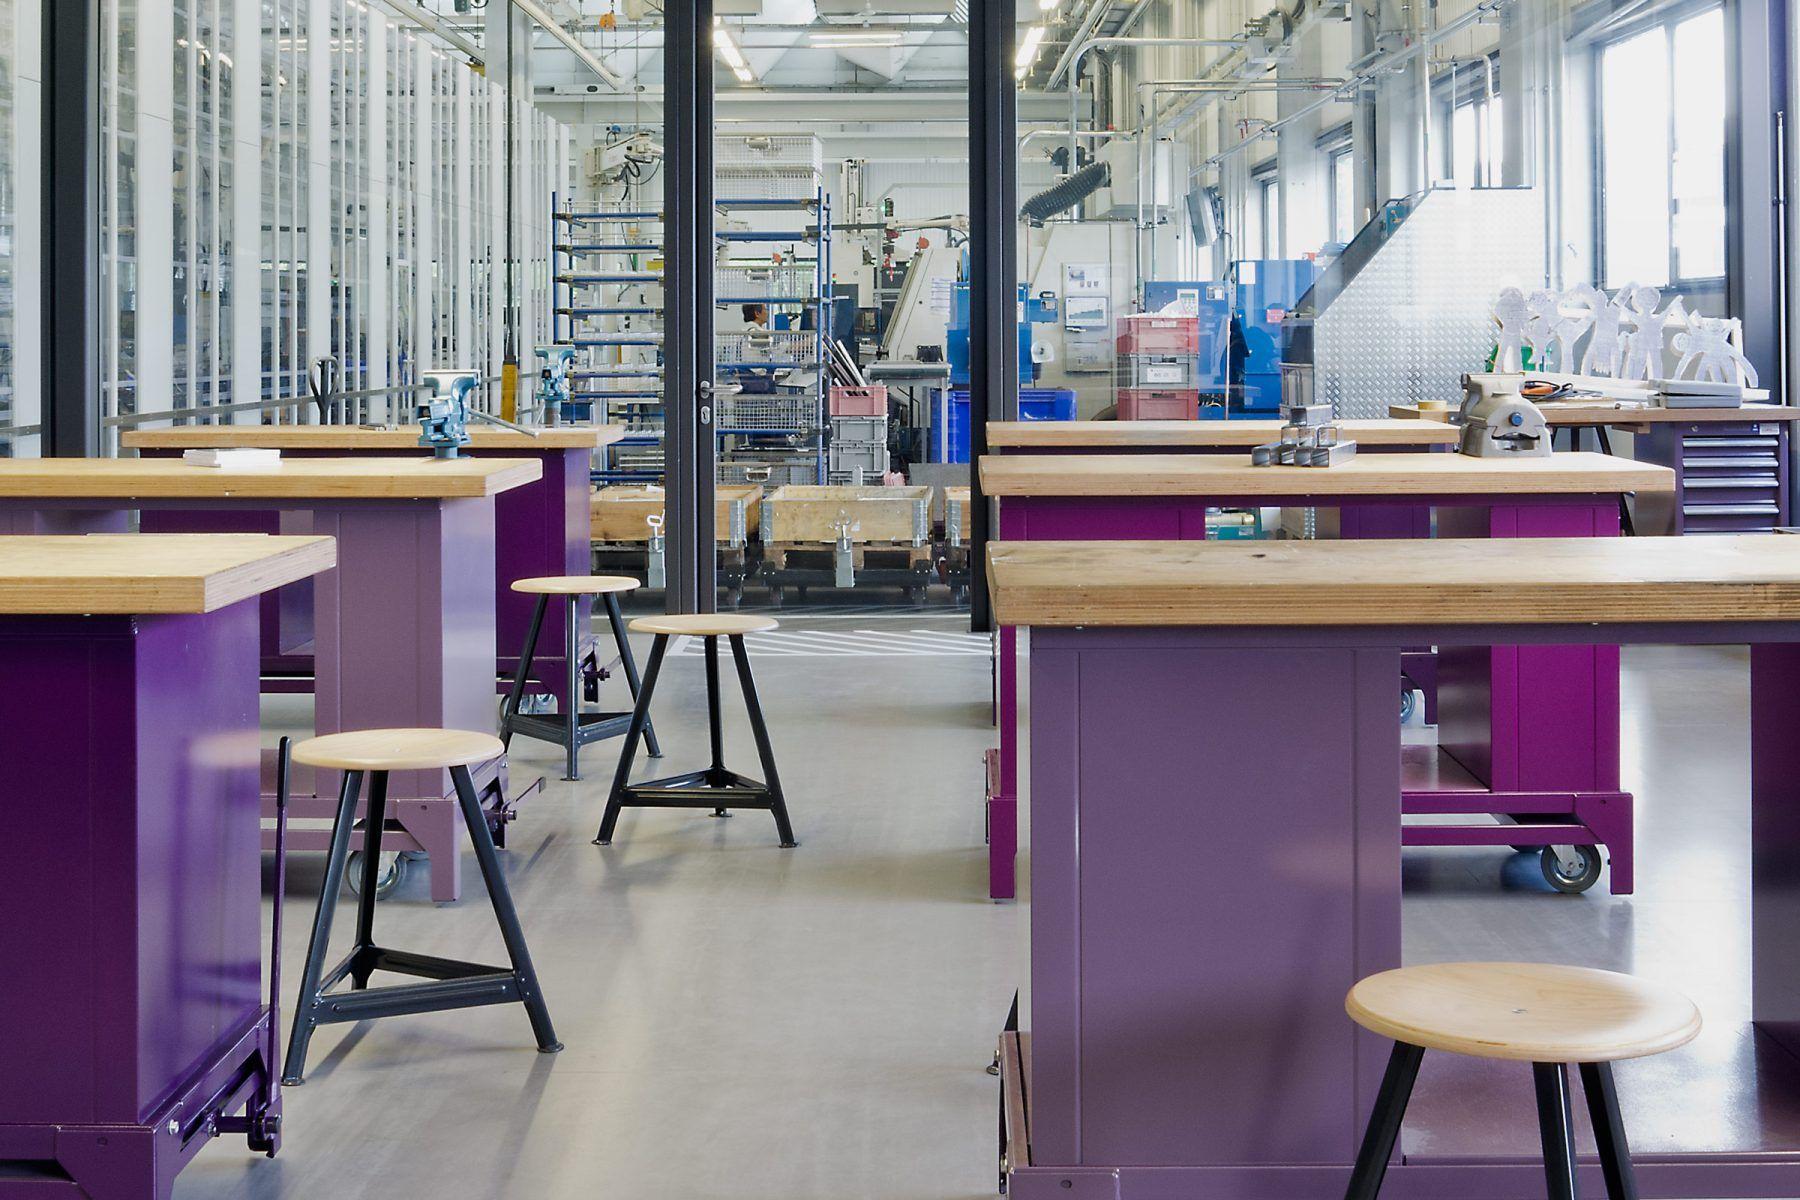 Interior Designer Ausbildung trumpf ausbildung büro münzing edu interior interiors